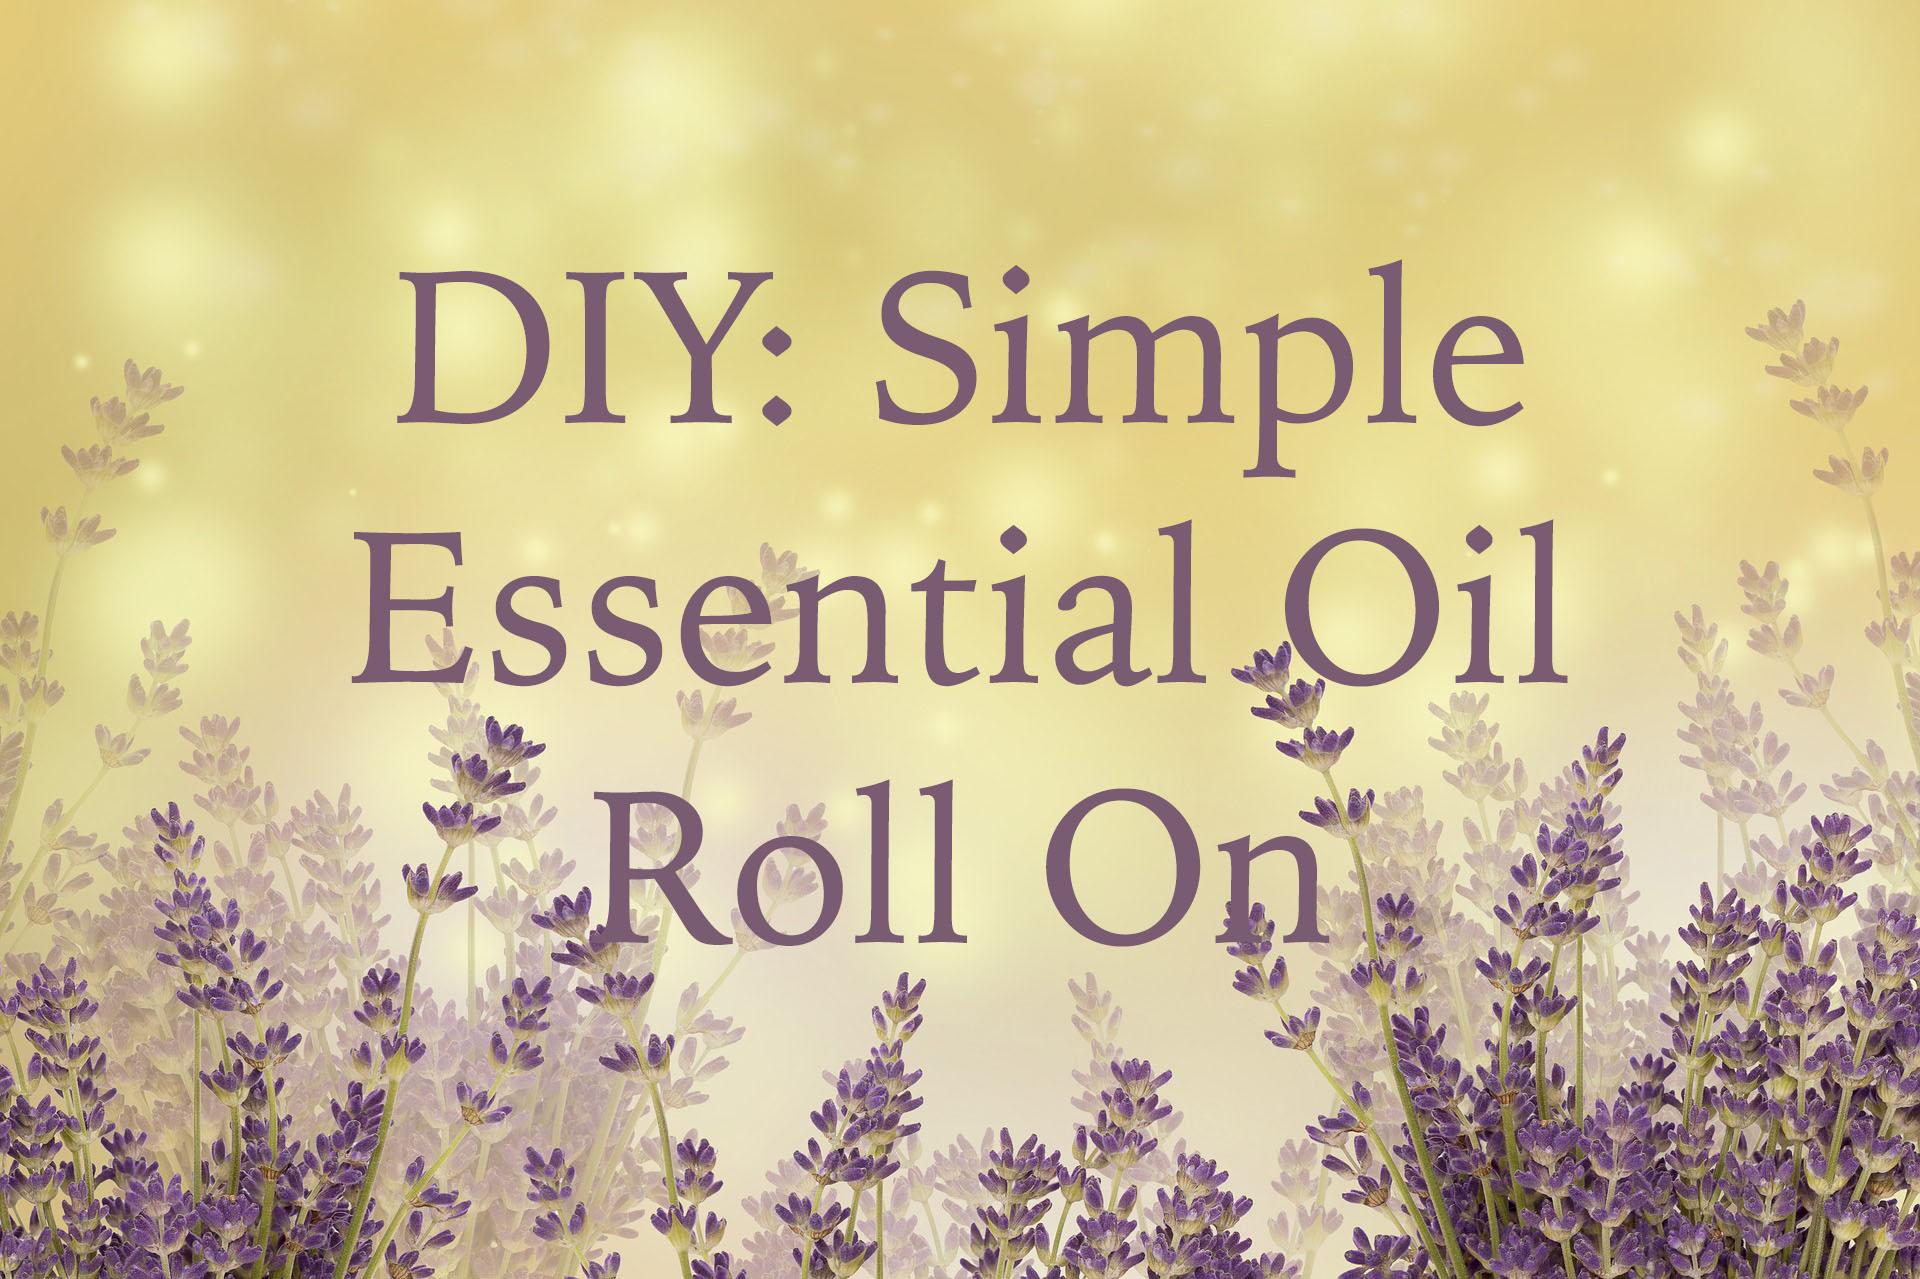 DIY Simple Essential Oil Roll On